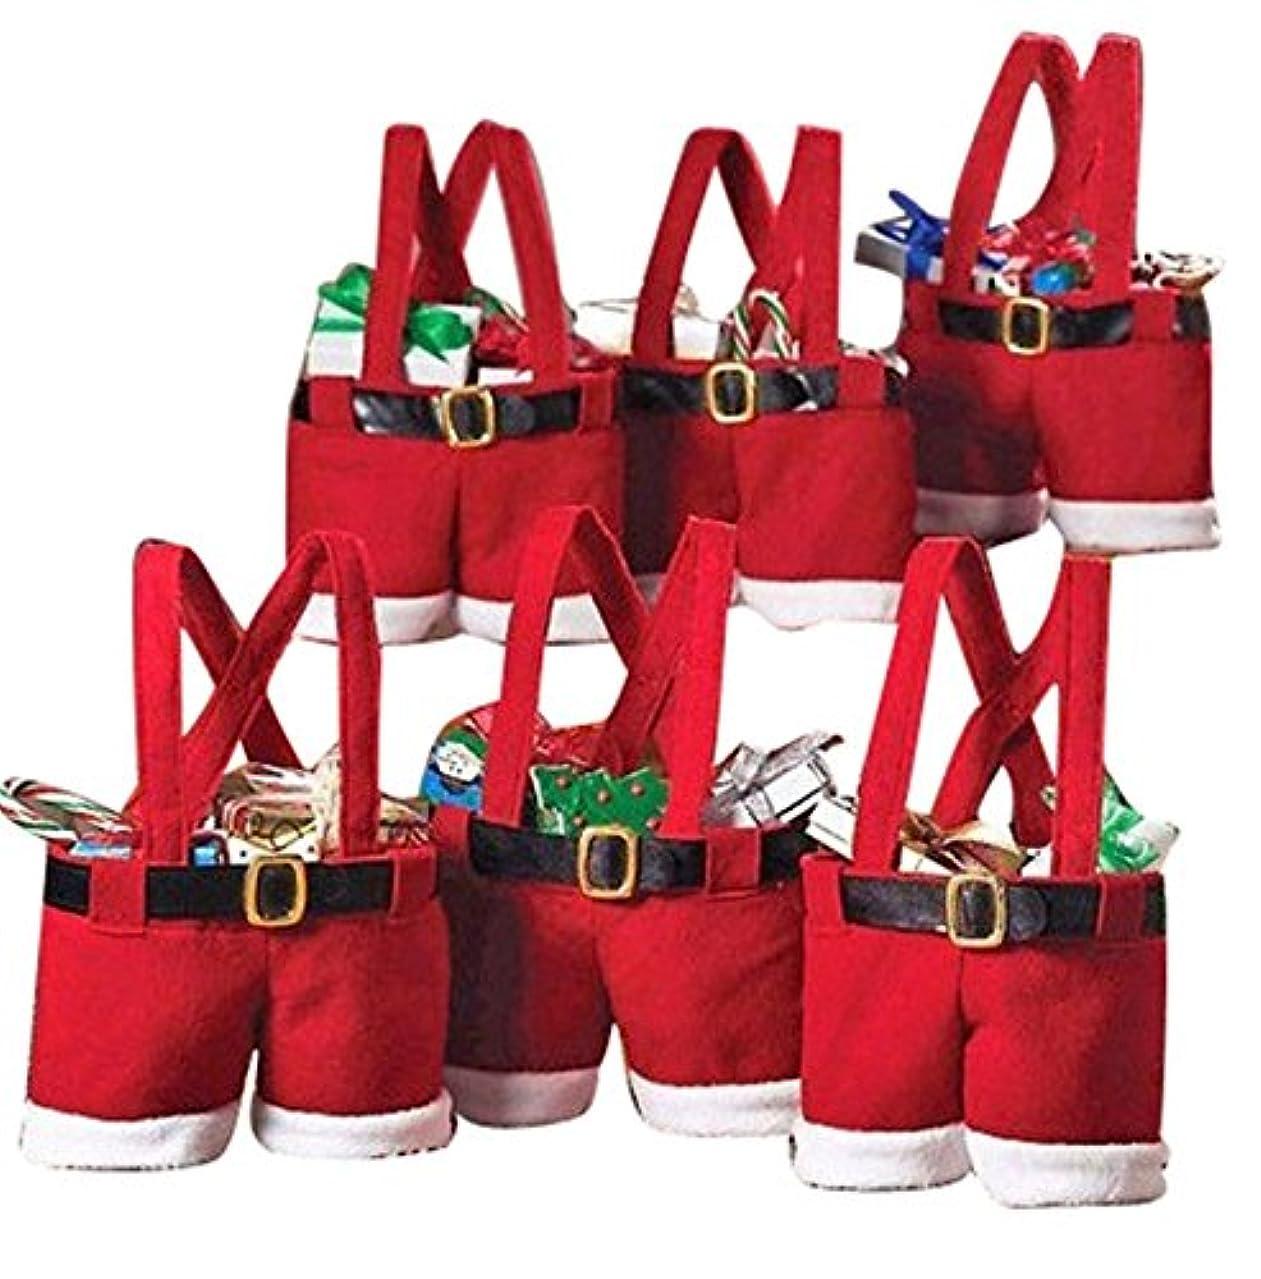 Barelove Valentine's day Christmas day Gift Engaged Double Wine Cooler Bag Freezable Wine Traveler Bag (6 set)